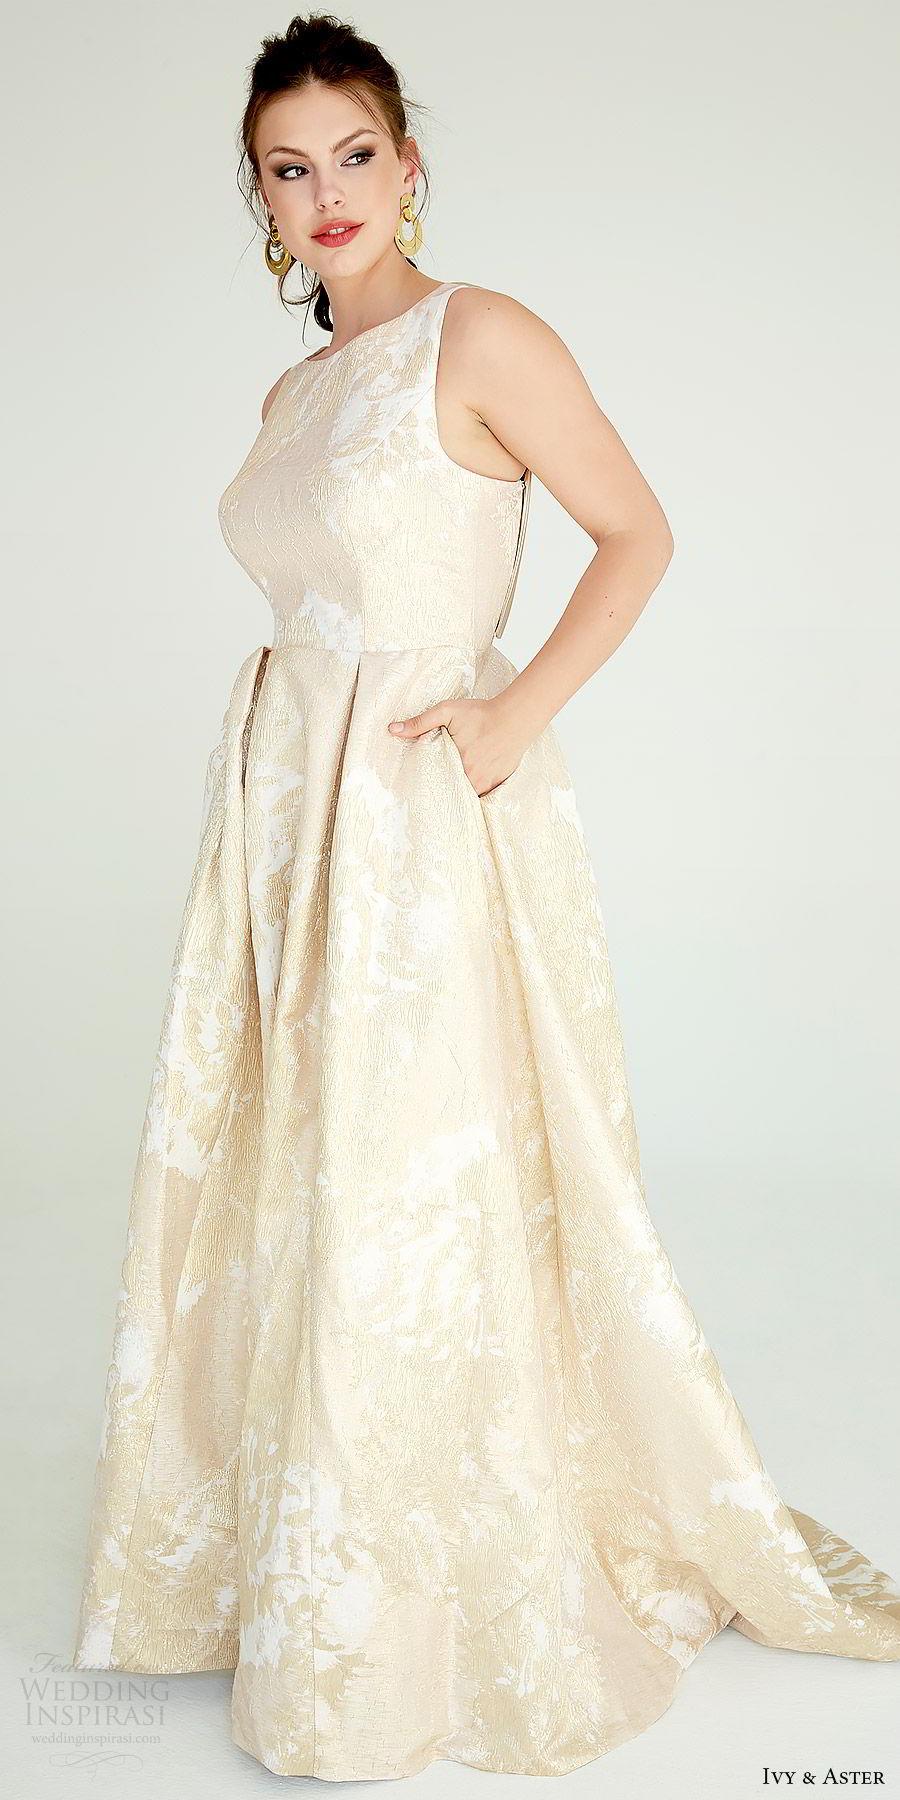 ivy aster bridal 2019 sleeveless straps jewel neck lace a line ball gown skirt wedding dress (delevigne) mv elegant gold color pockets